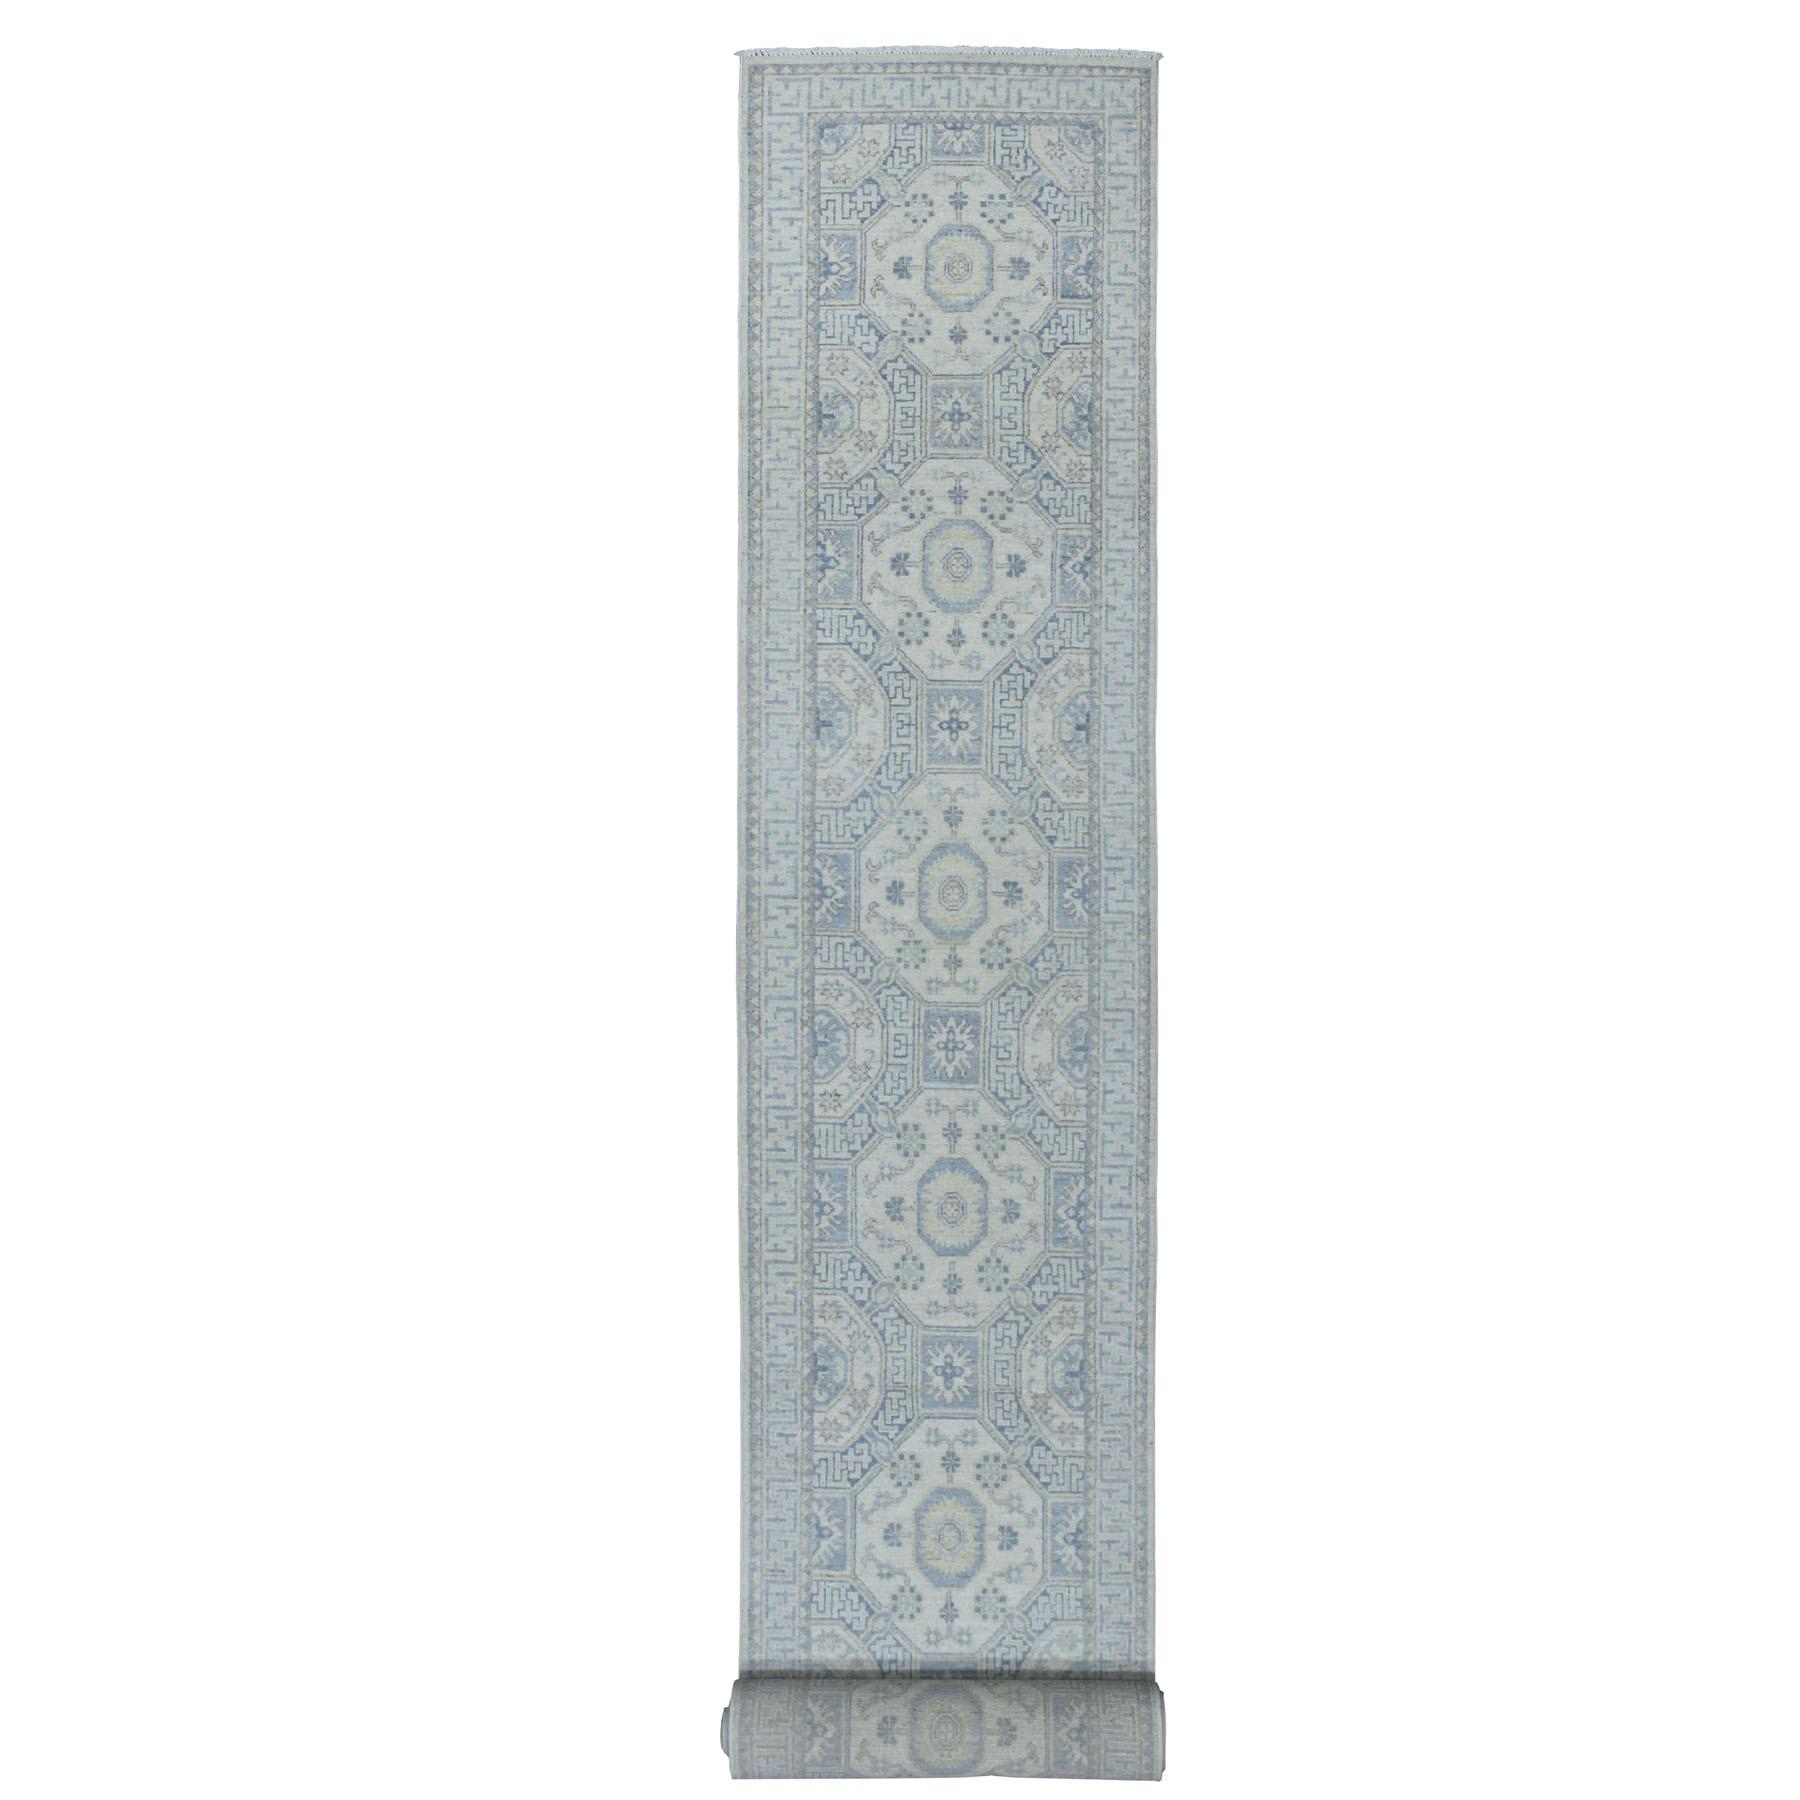 "2'7""X26'5"" White Wash Peshawar Khotan Design Pure Wool Hand Knotted Xl Runner Orientals Rug moaedb6b"